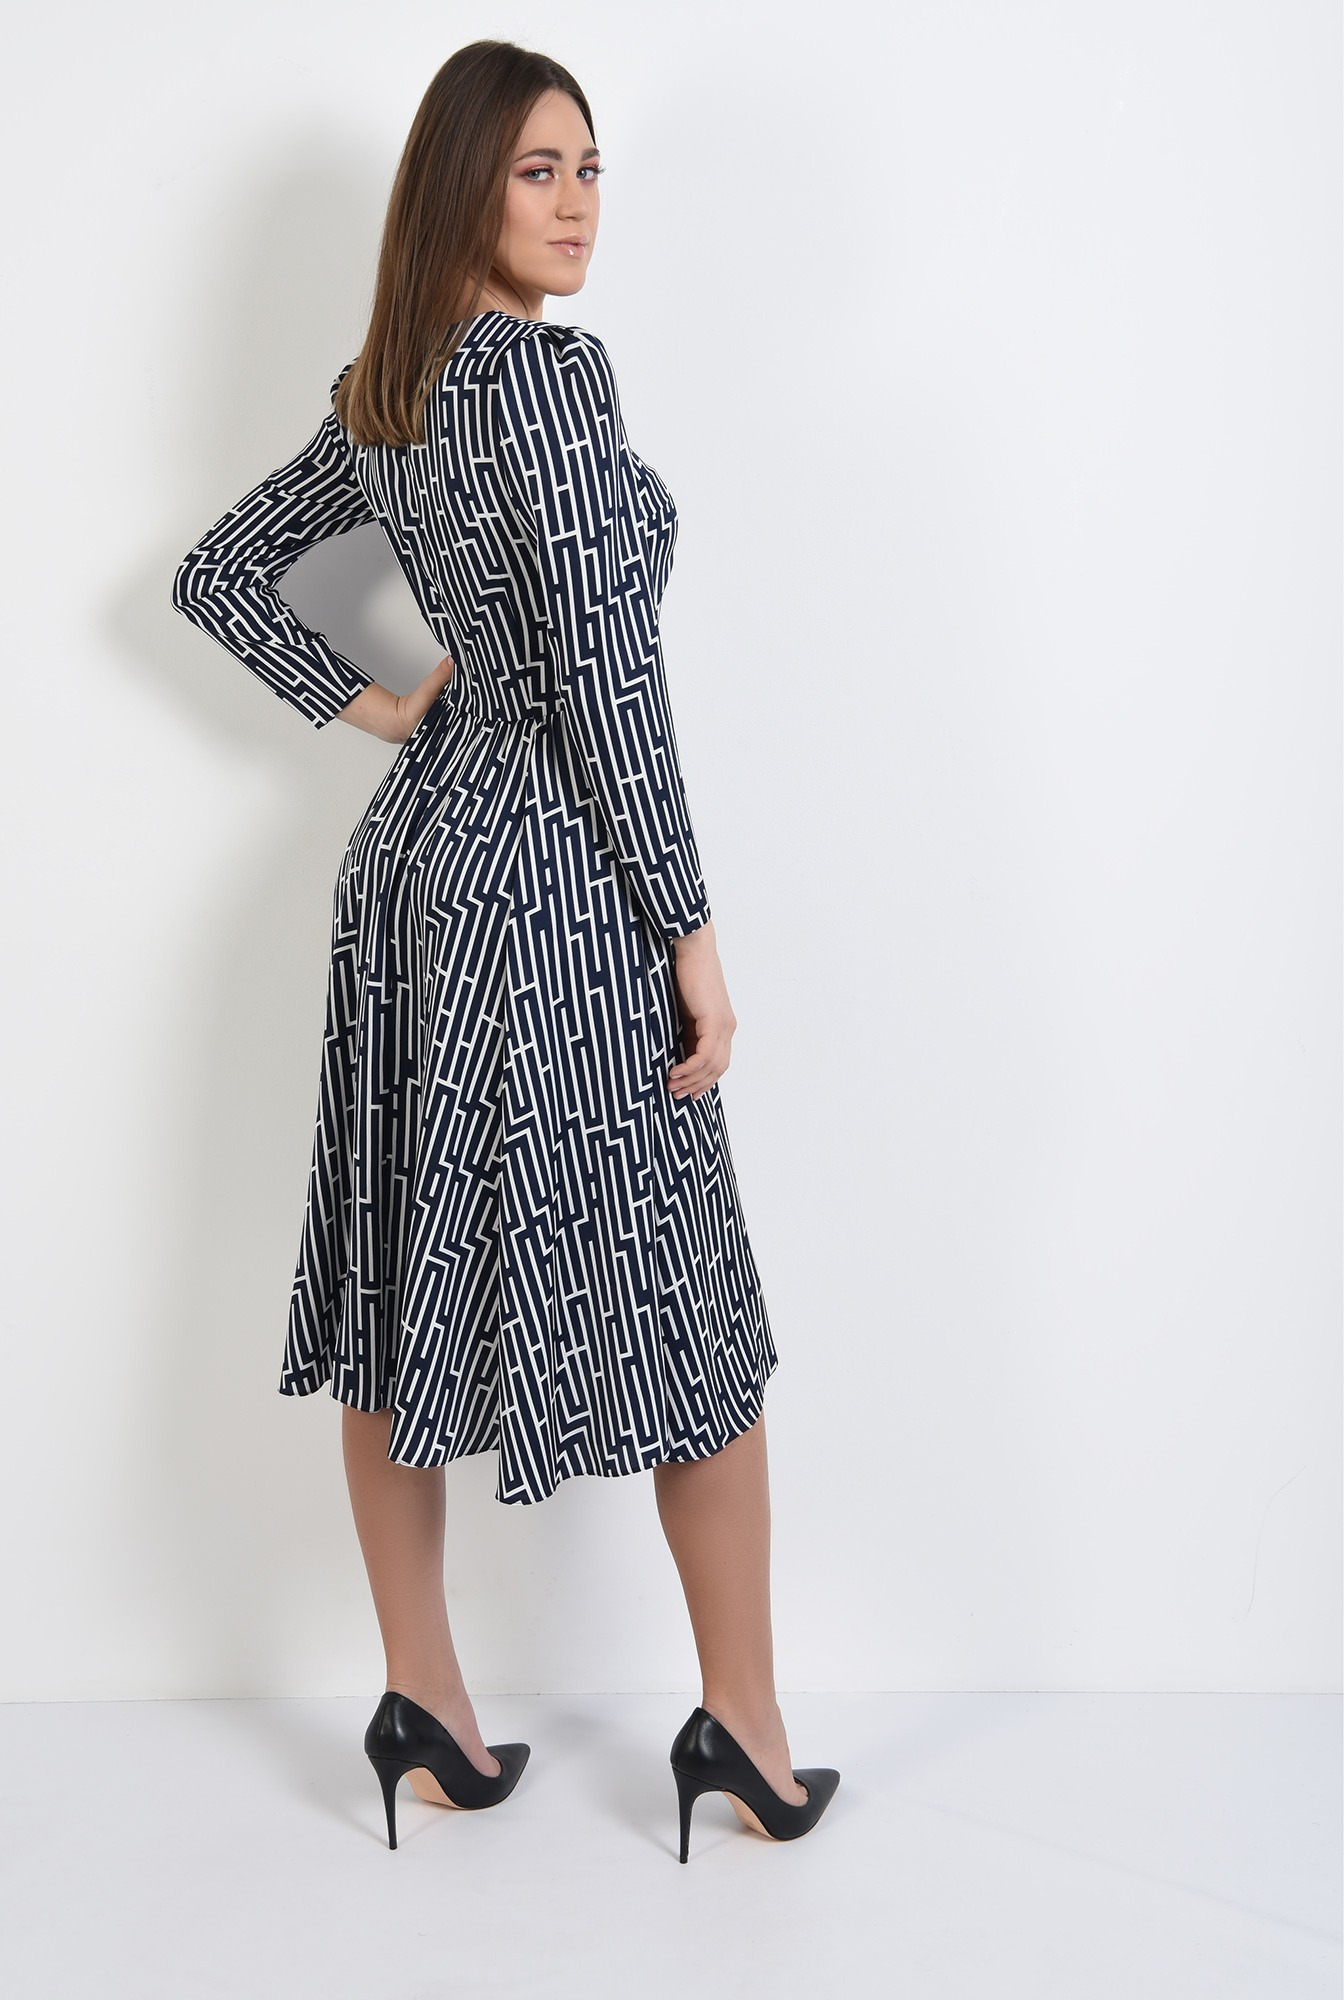 1 -  rochie midi, evazata, cu motive geometrice, maneci lungi, bleumarin